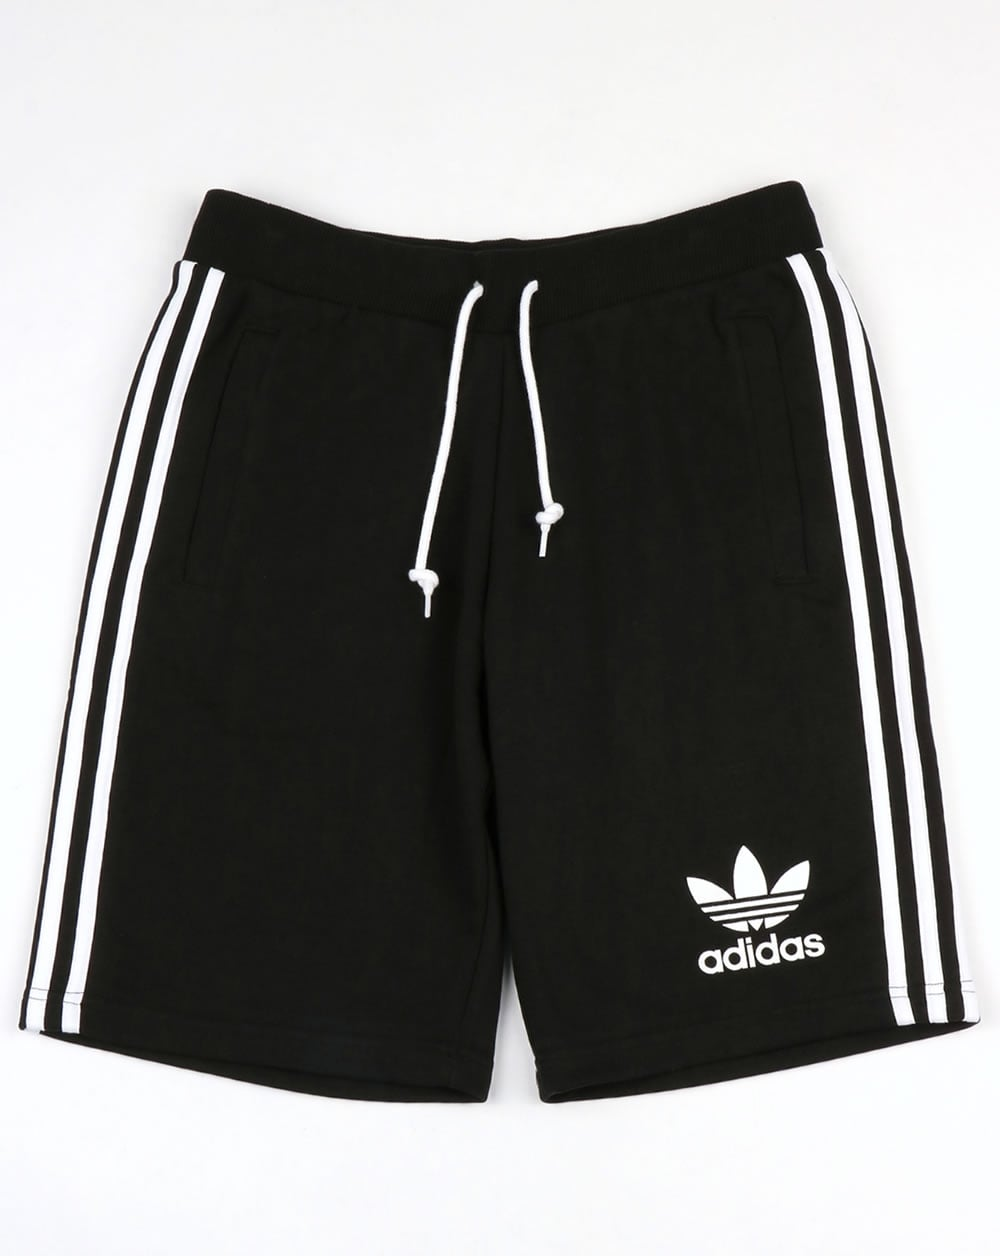 7796ec5fda67 adidas Originals Adidas Originals 3 Striped Shorts Black White